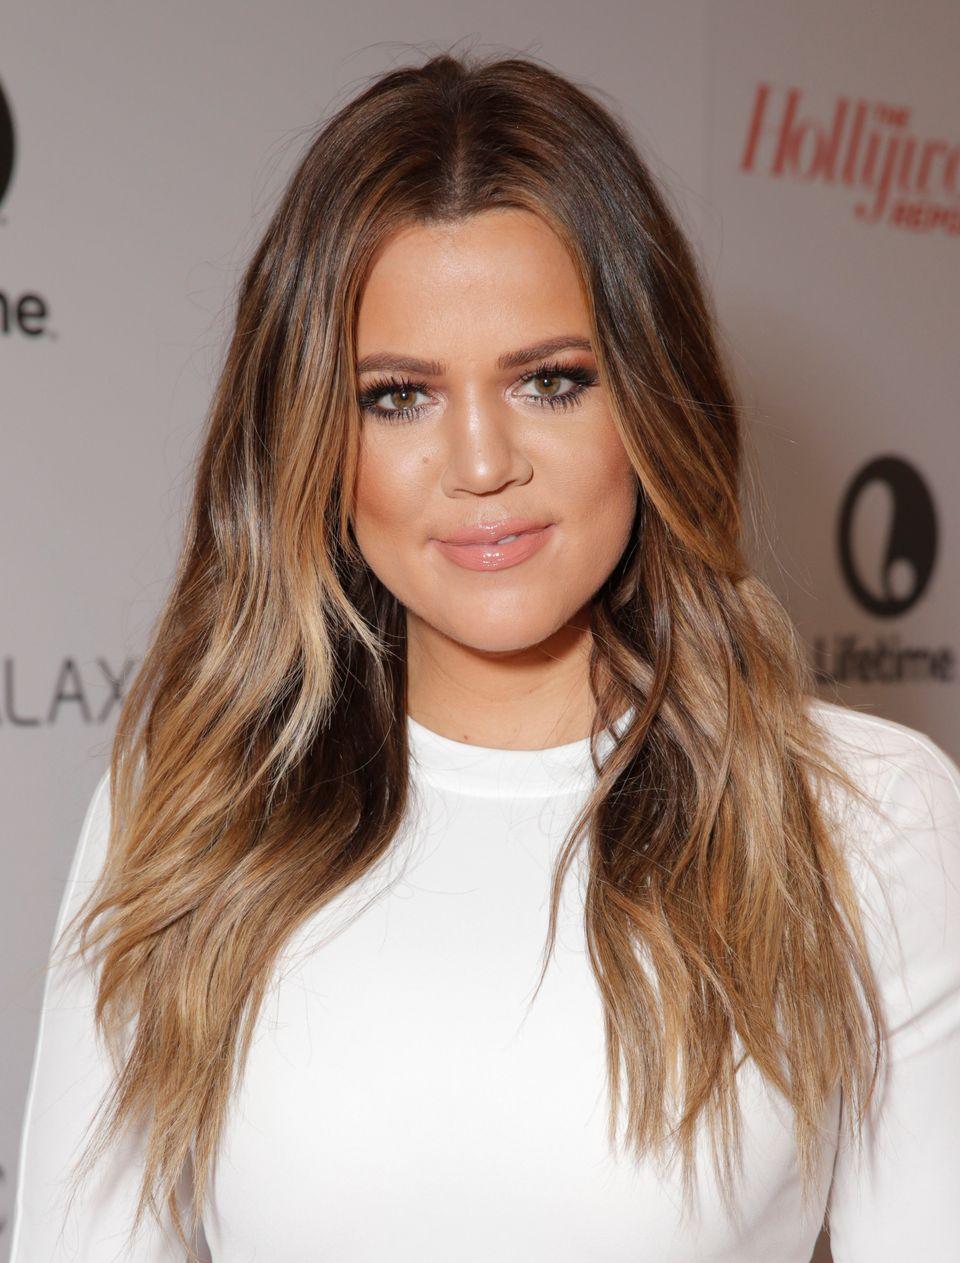 Khloe Kardashian arrives at The Hollywood Reporter's celebration of power 100 women in entertainment breakfast on Wednesday,